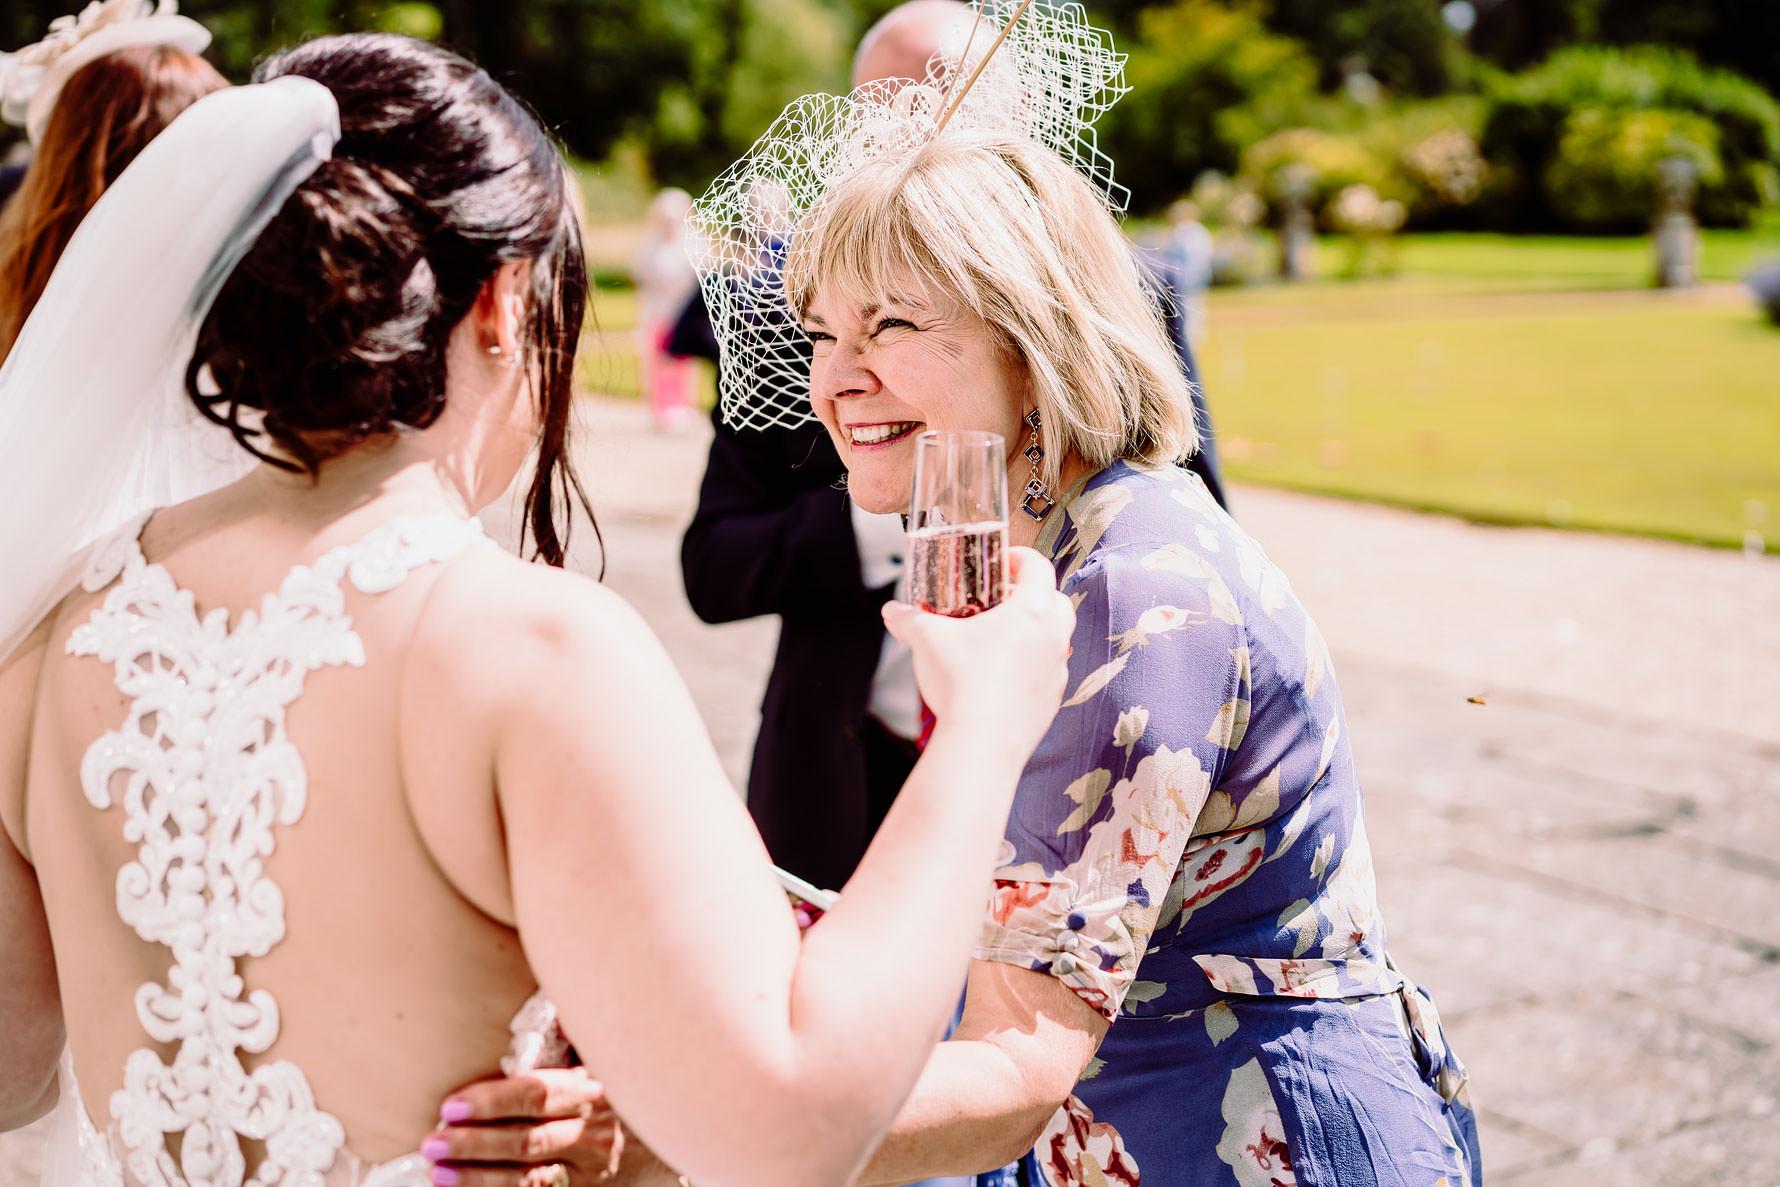 a guest congratulates the bride